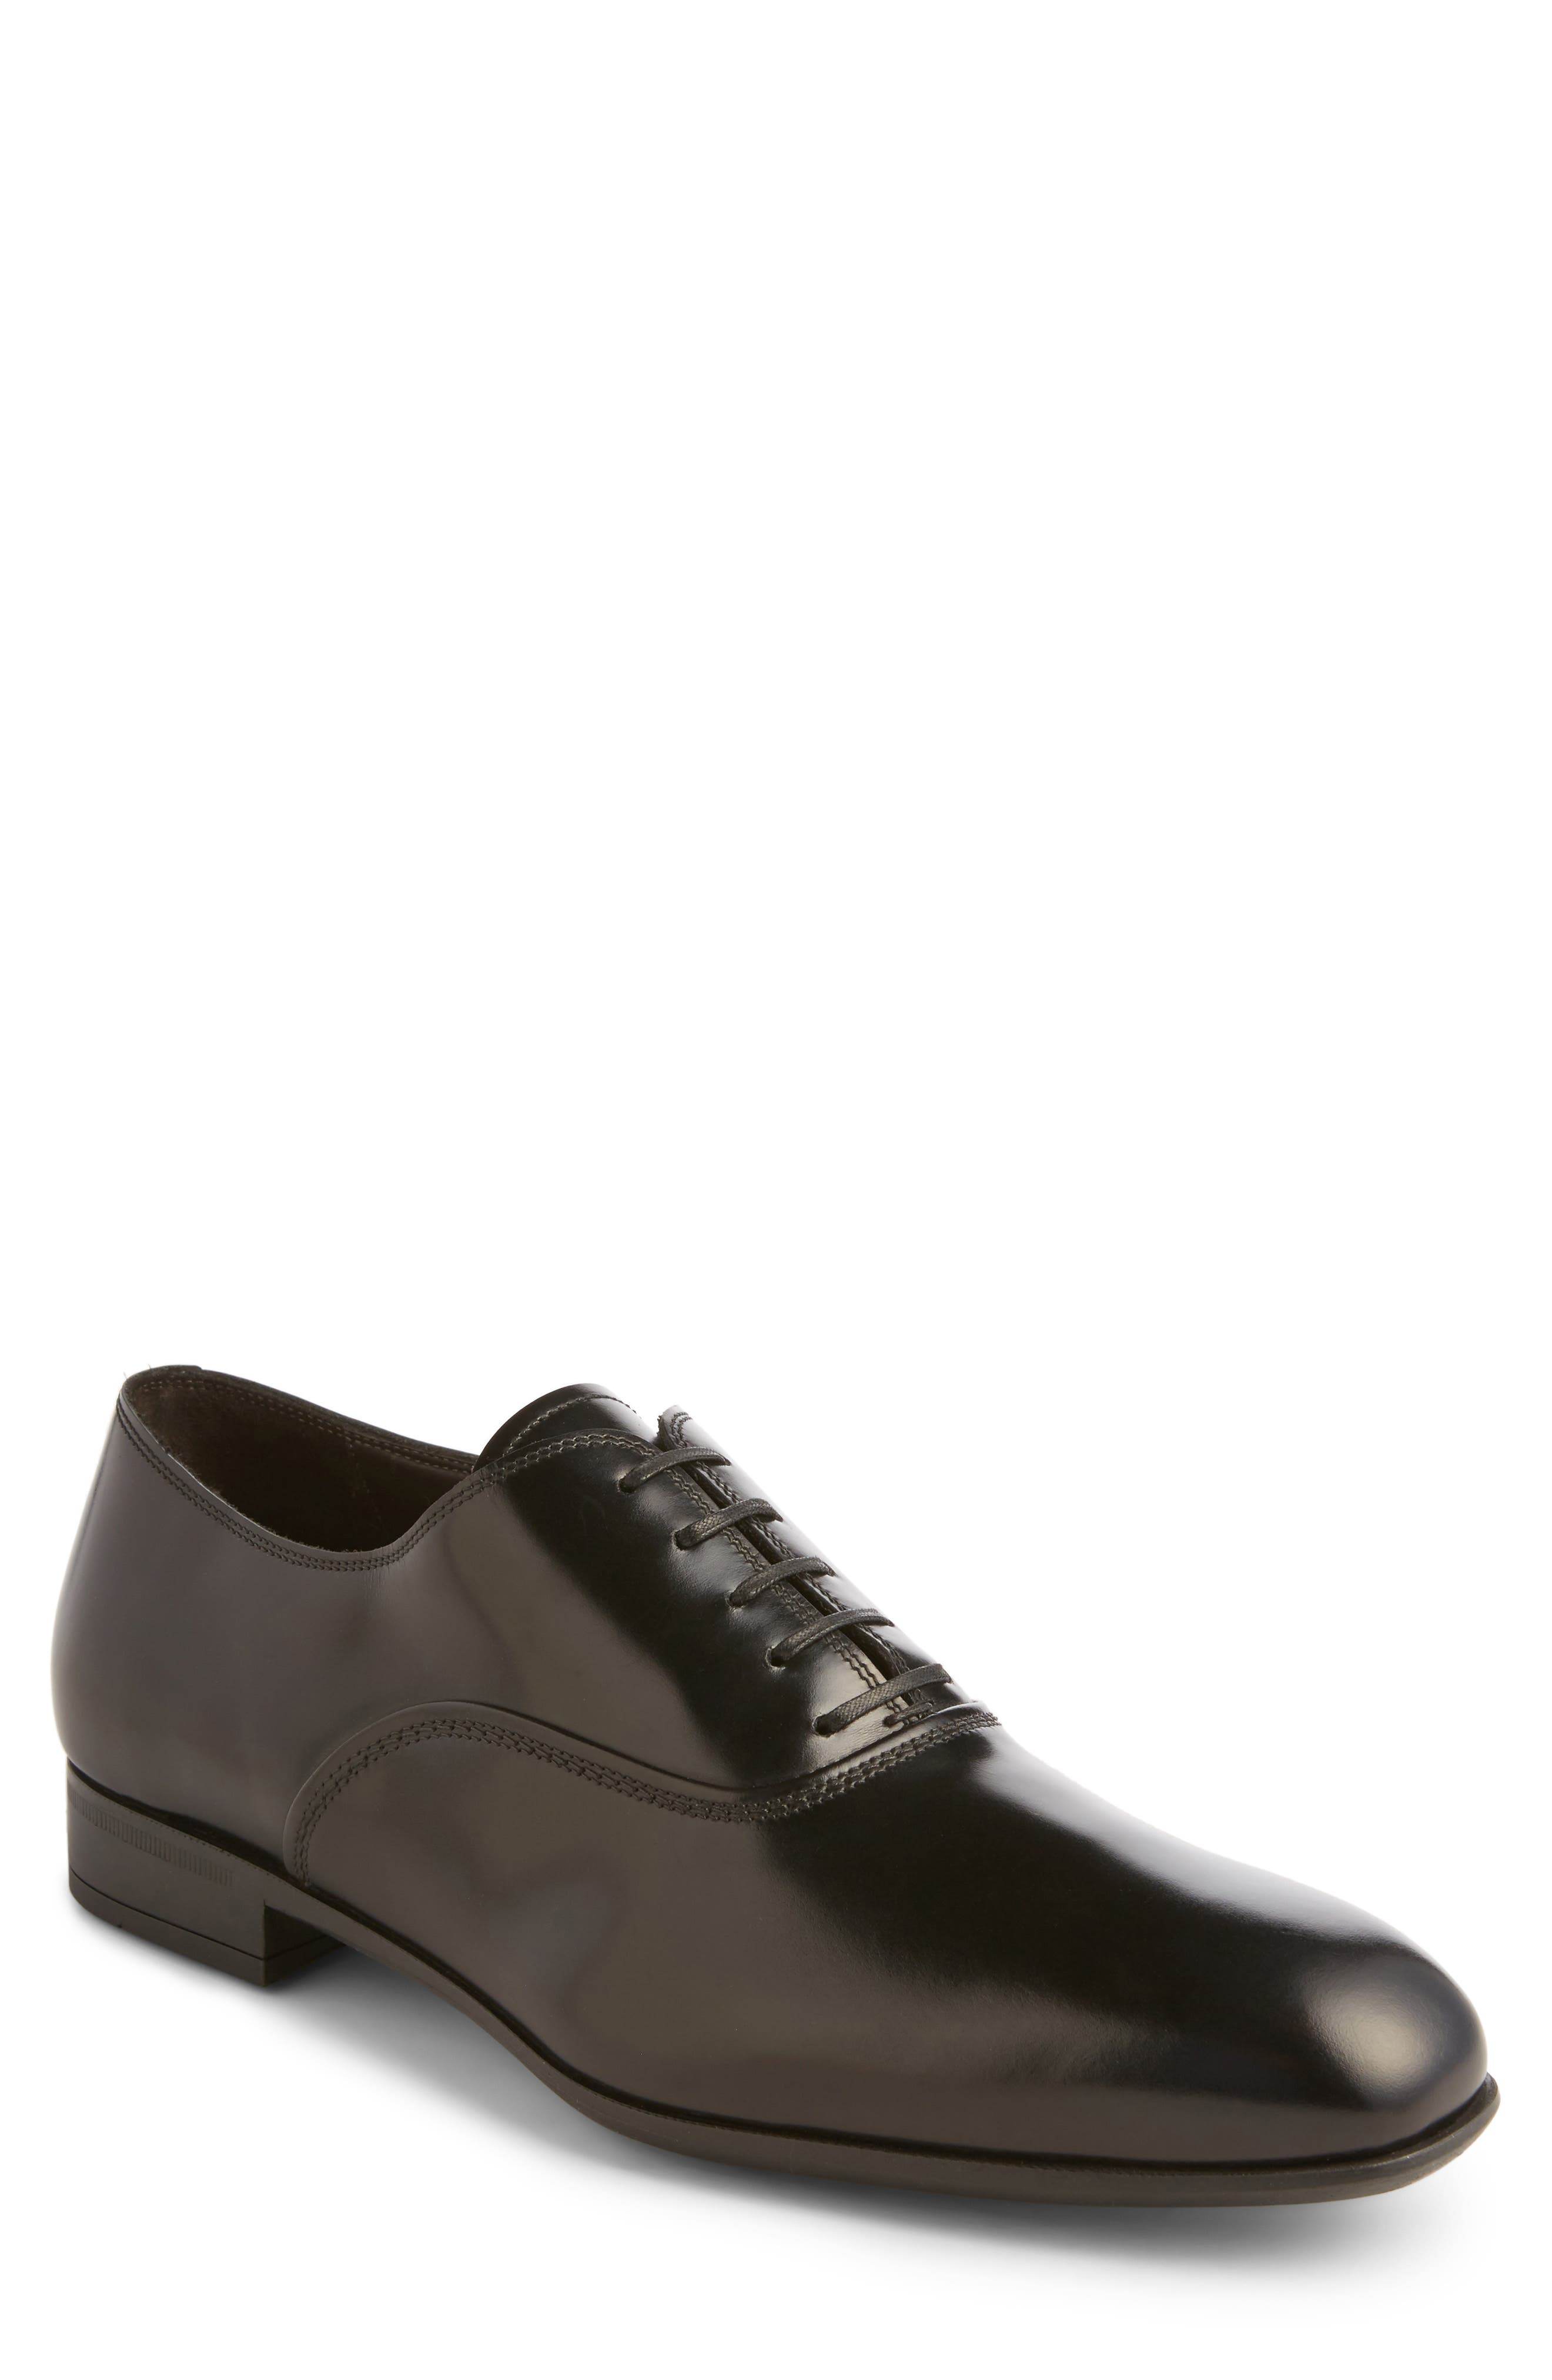 Salvatore Ferragamo Dunn Derby Plain Toe Oxford (Men)